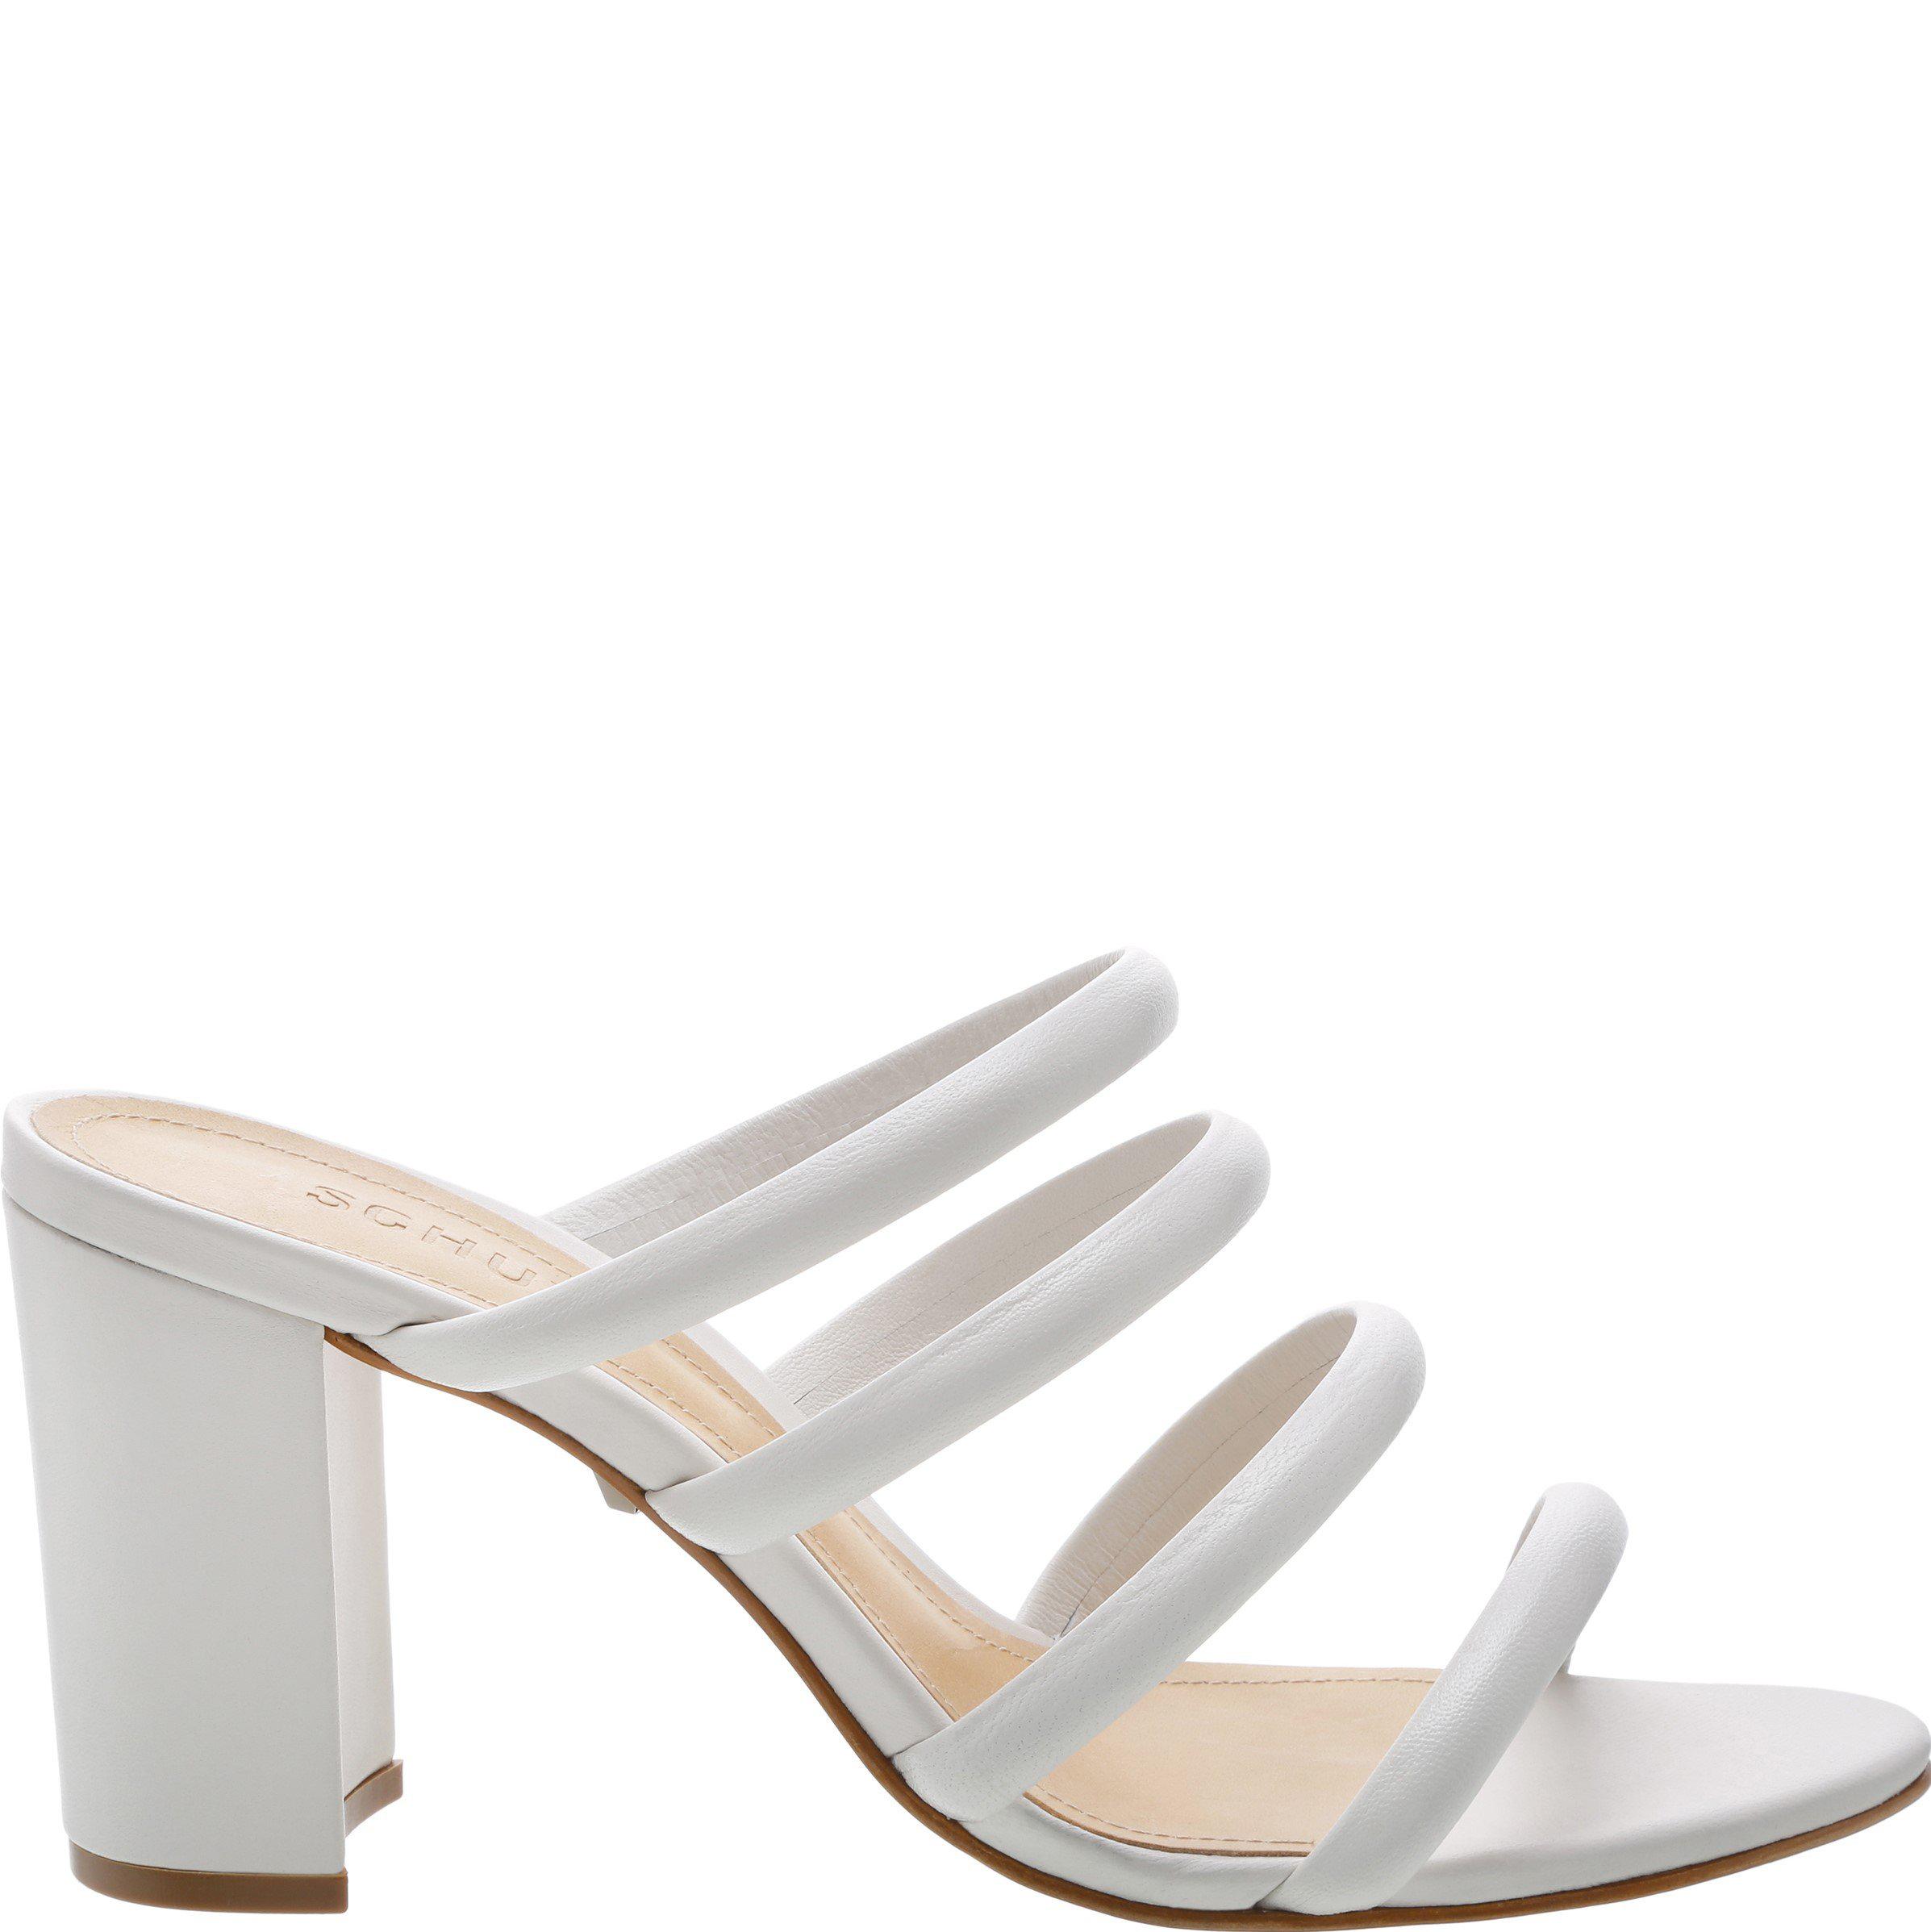 8b4a7a469fe Schutz Women s Felisa Leather High Block-Heel Sandals In Pearl ...